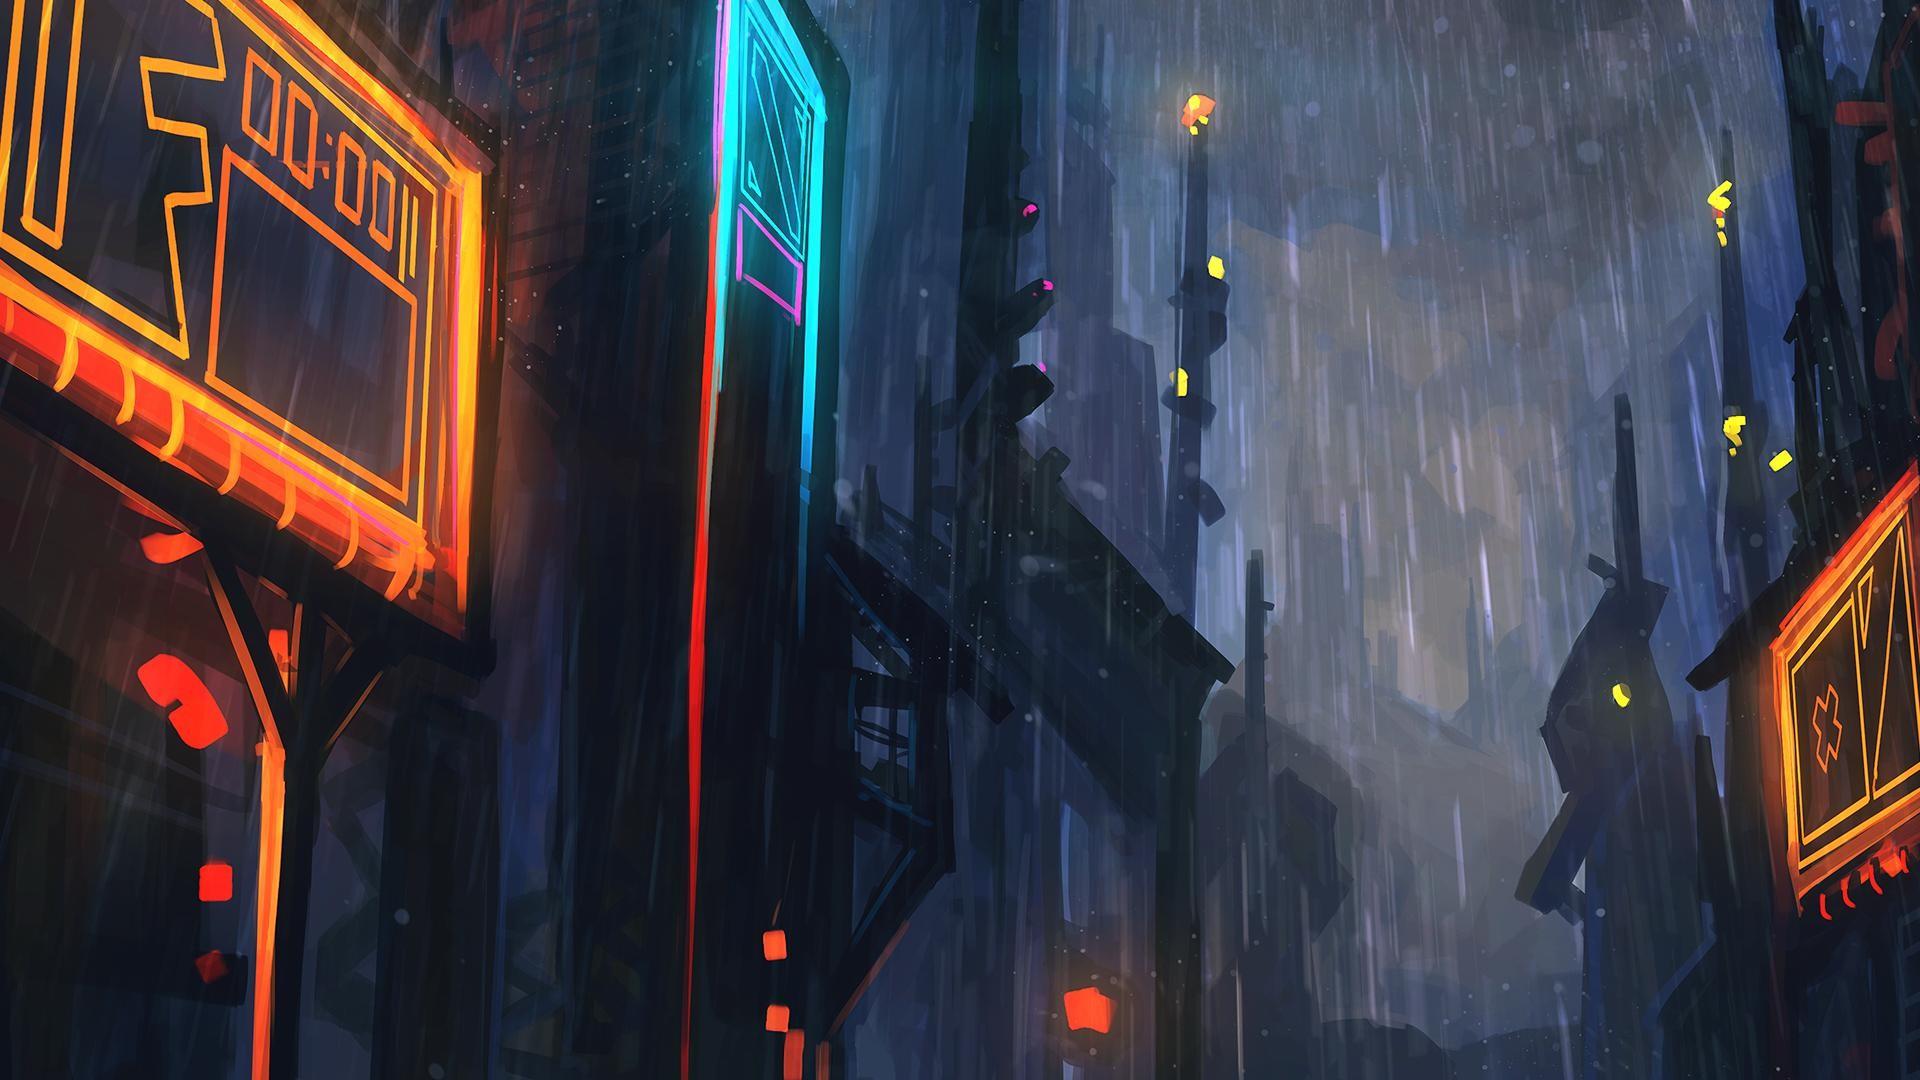 Wallpaper : night, artwork, blue, Monstercat, light, color